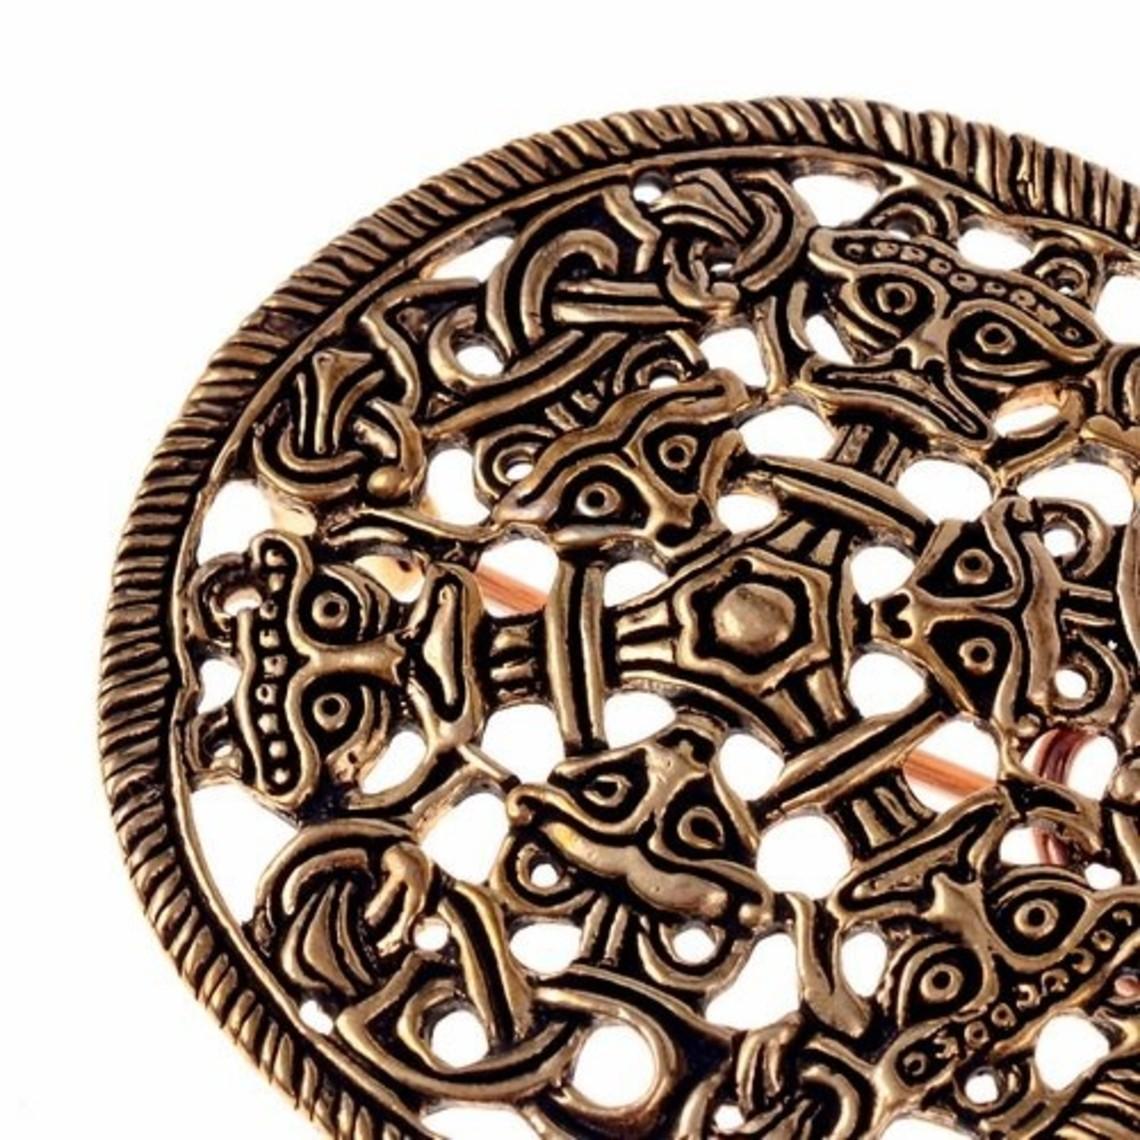 Borrestijl schijffibula, brons